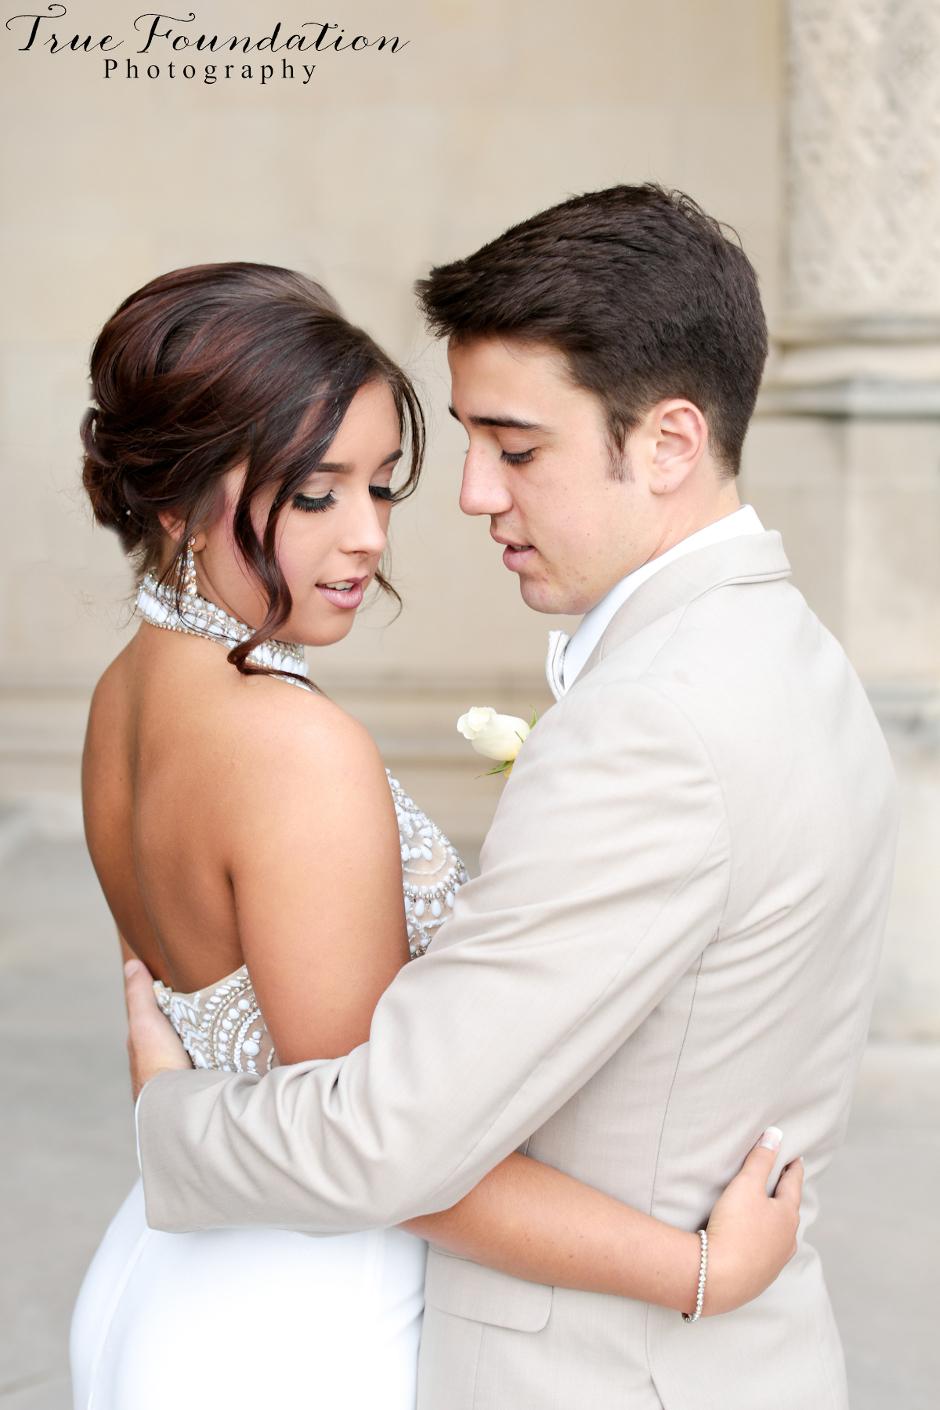 Senior - Prom - Photography - Photos - North - Carolina - NC - Photographer - Biltmore - Hendersonville - Greenville - Charlotte - High - School - Dance (23)